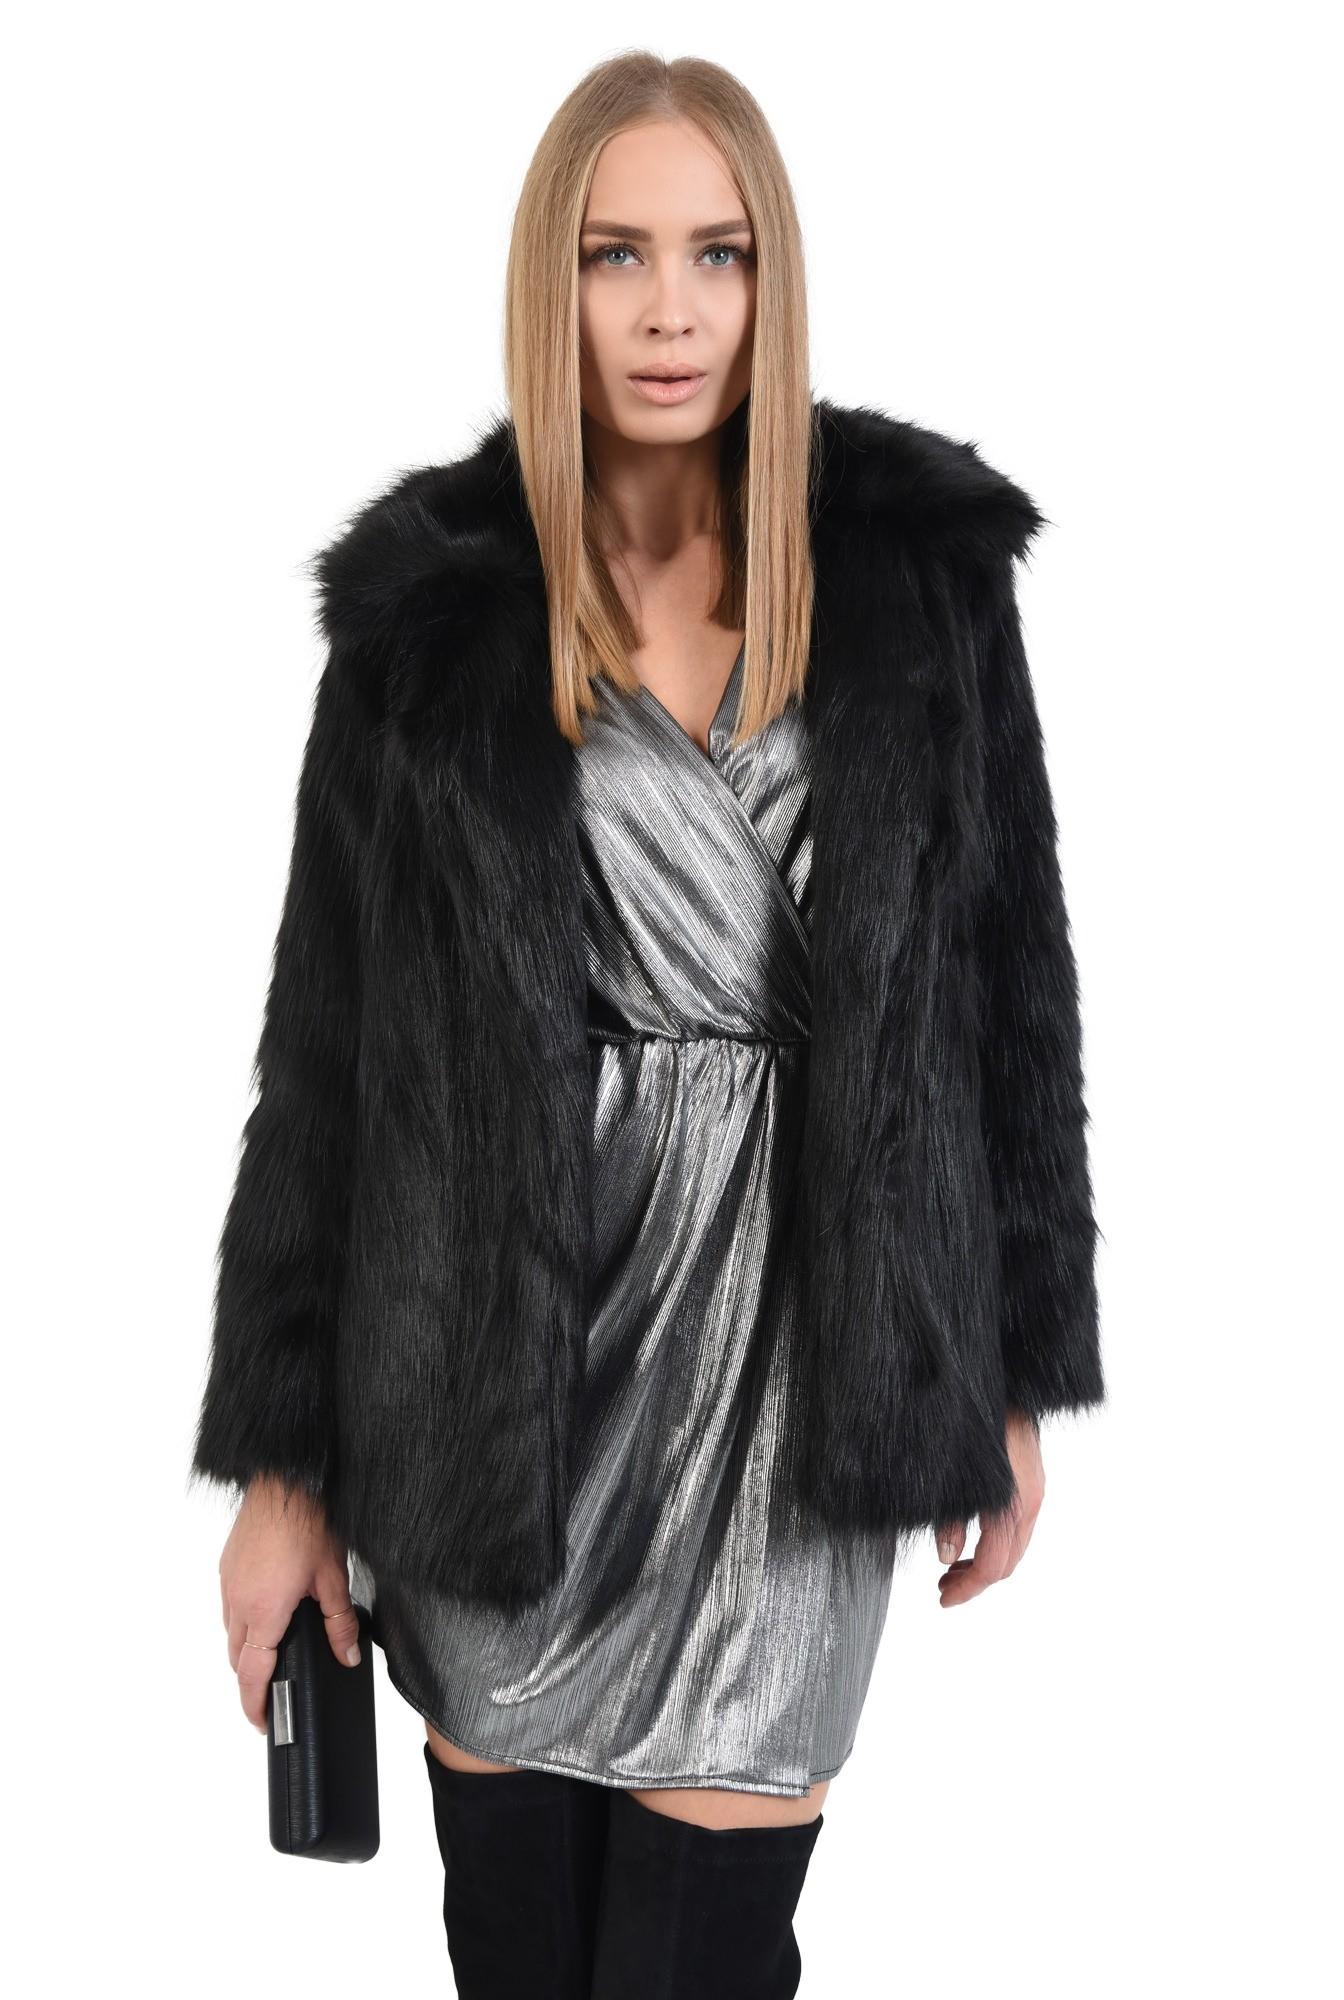 0 - jacheta din blana artificiala, croi drept, jacheta dama, haina blana online